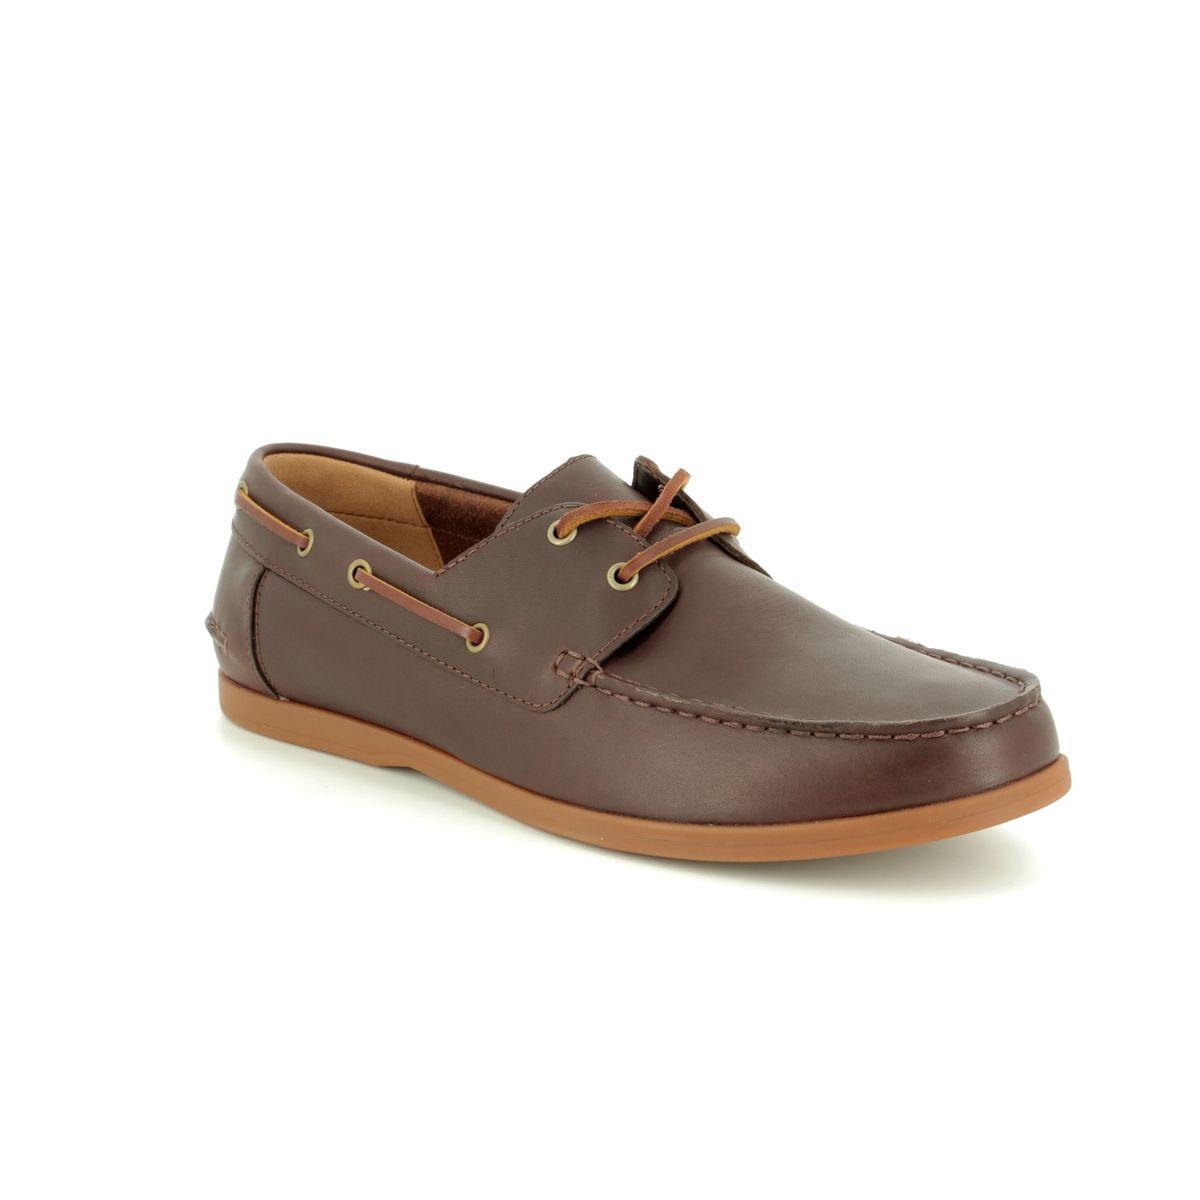 official images low price sale classic shoes 324807G MORVEN SAIL